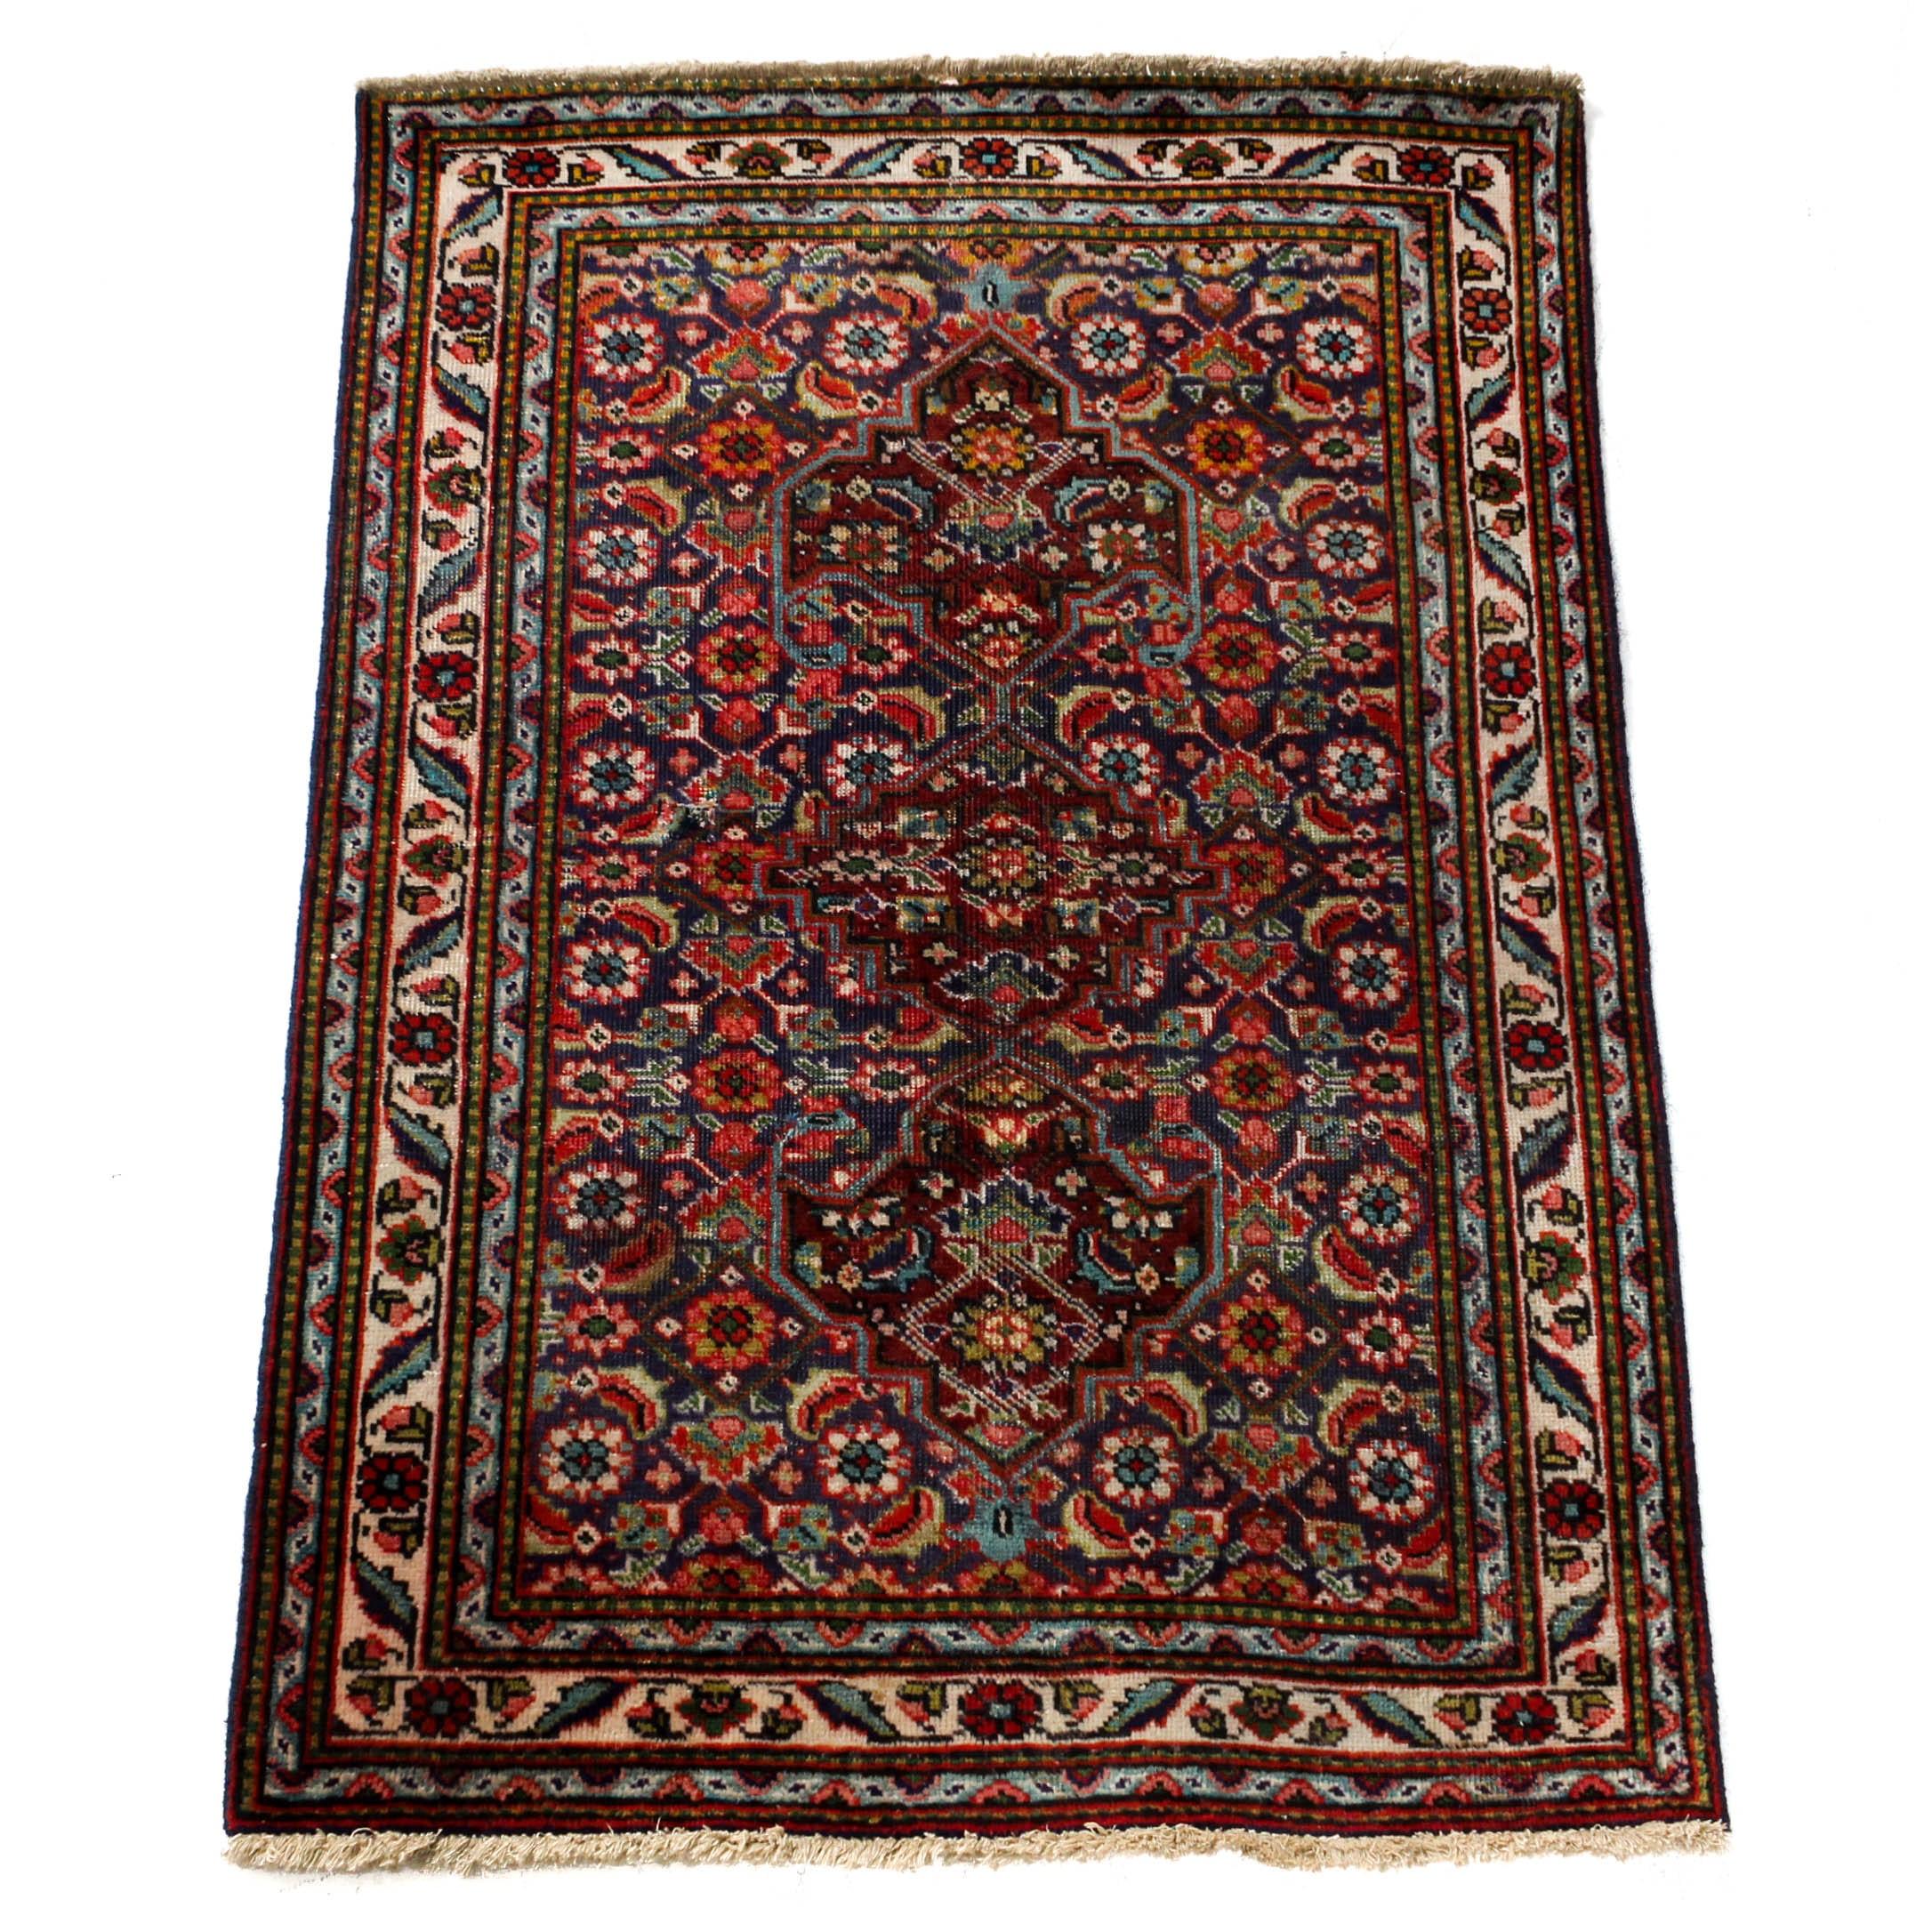 Vintage Hand-Knotted Persian Tabriz Rug